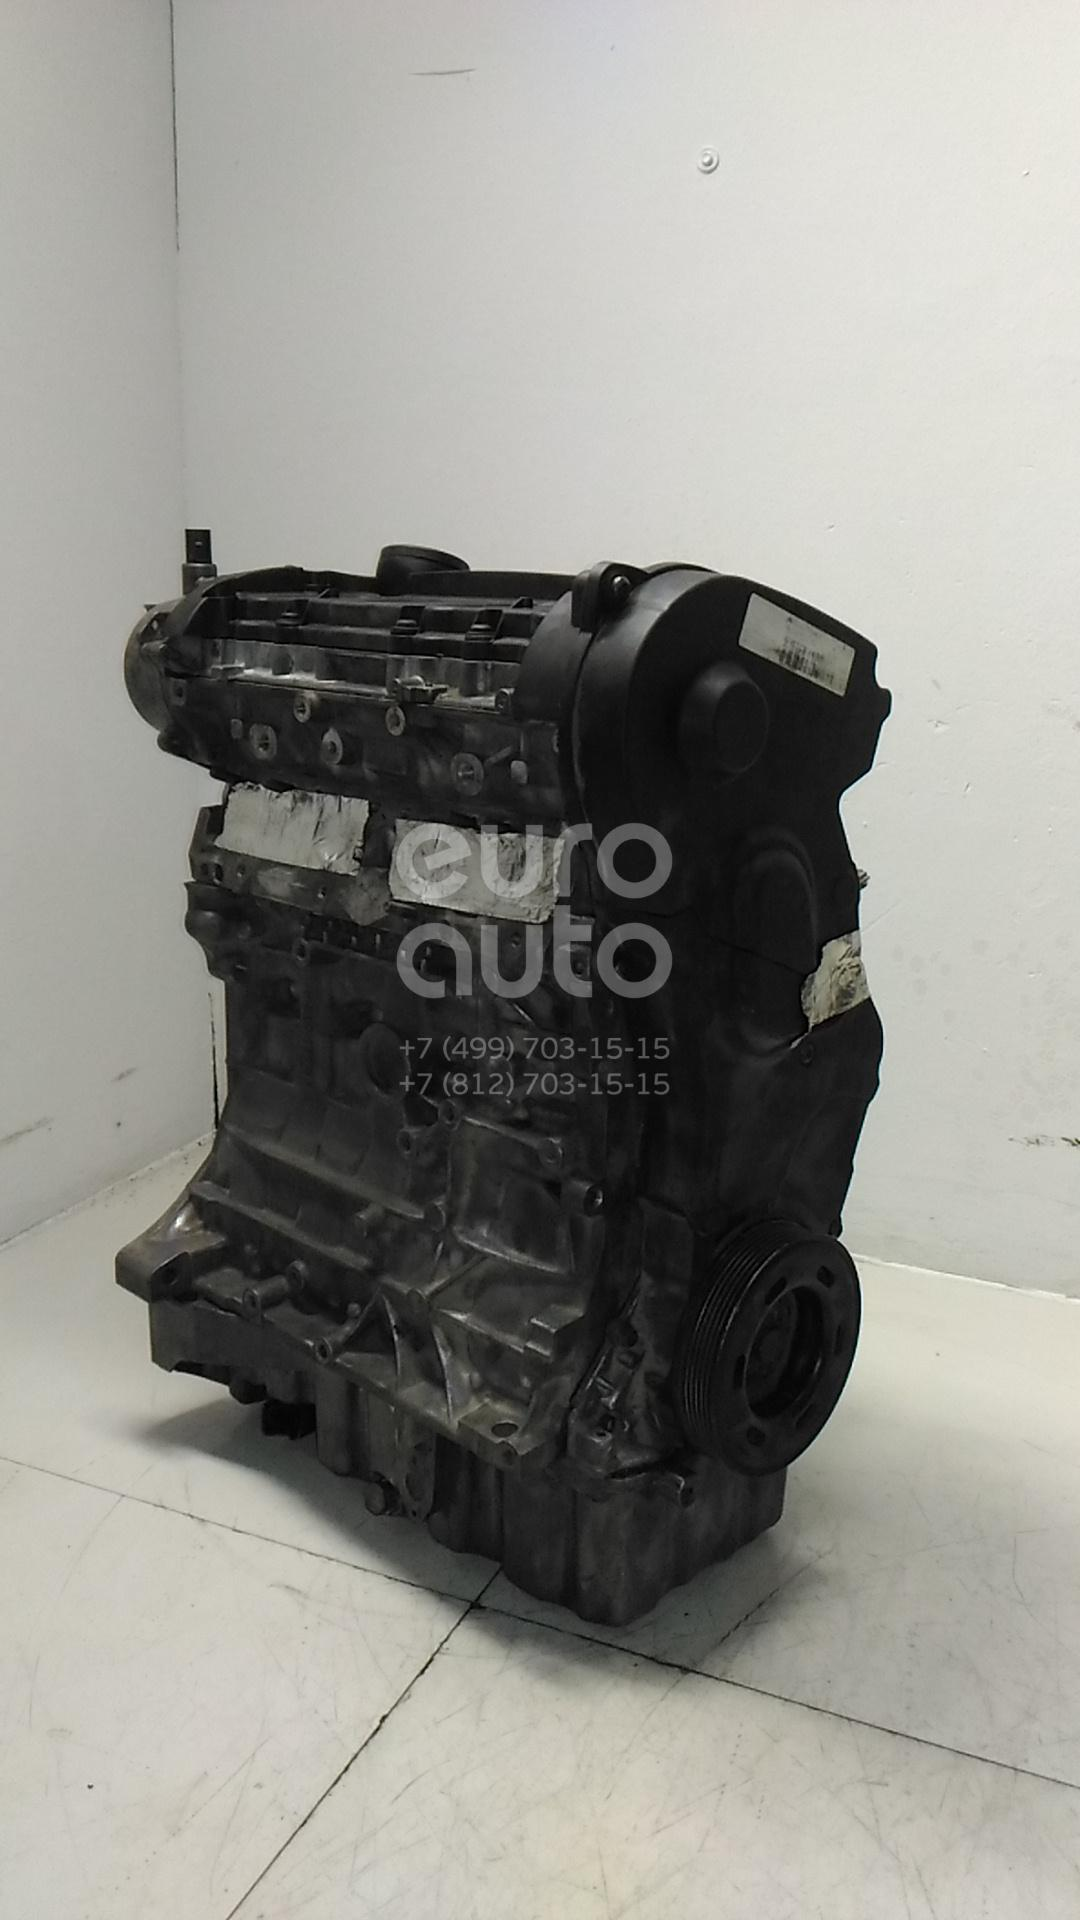 Двигатель для Skoda,VW,Seat Octavia (A5 1Z-) 2004-2013;Passat [B6] 2005-2010;Jetta 2006-2011;Altea 2004-2015;Toledo III 2004-2009;EOS 2006-2015 - Фото №1